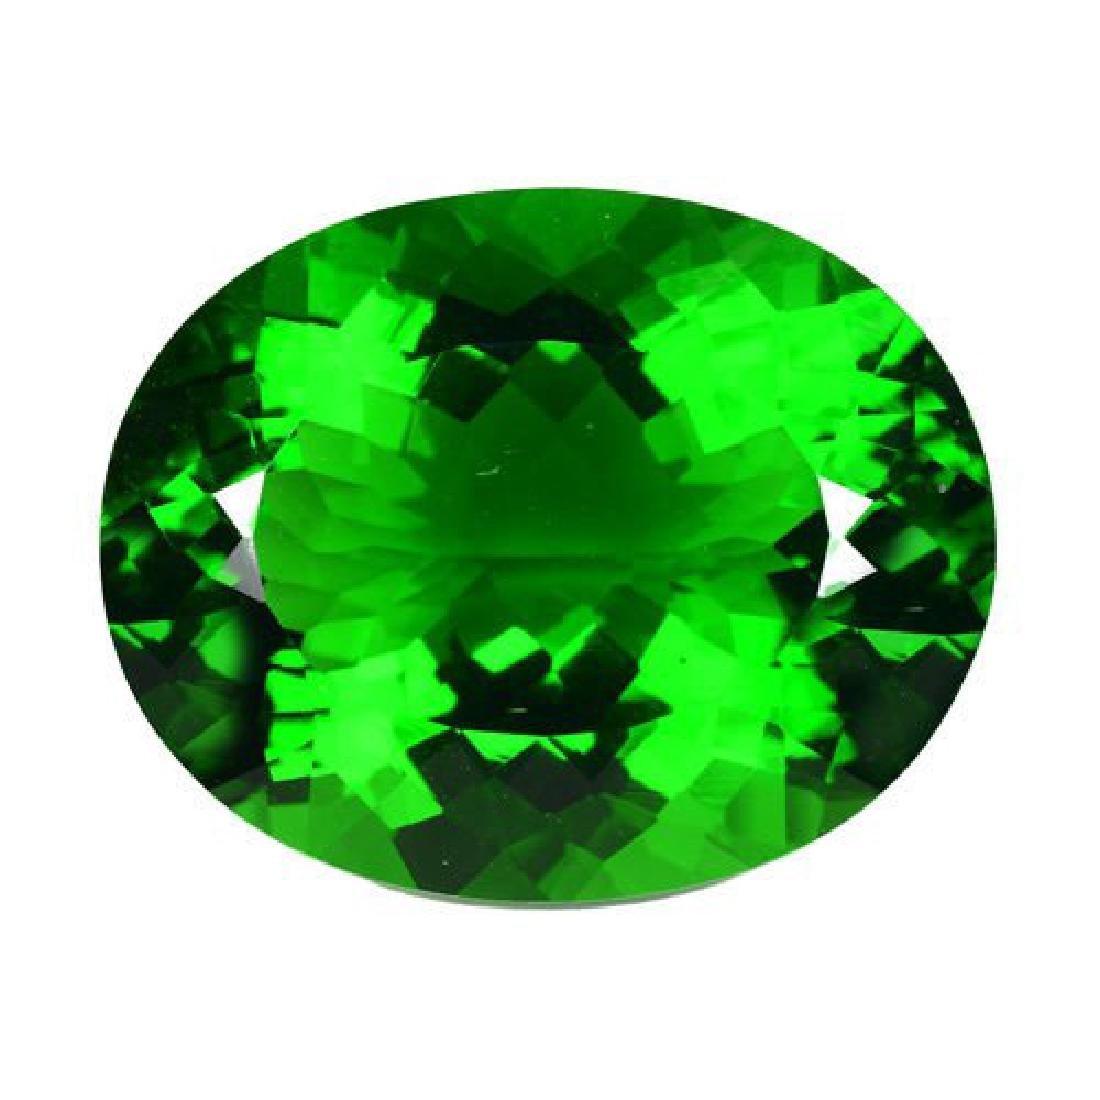 Natural Green Amethyst 53.82 Carats - VVS